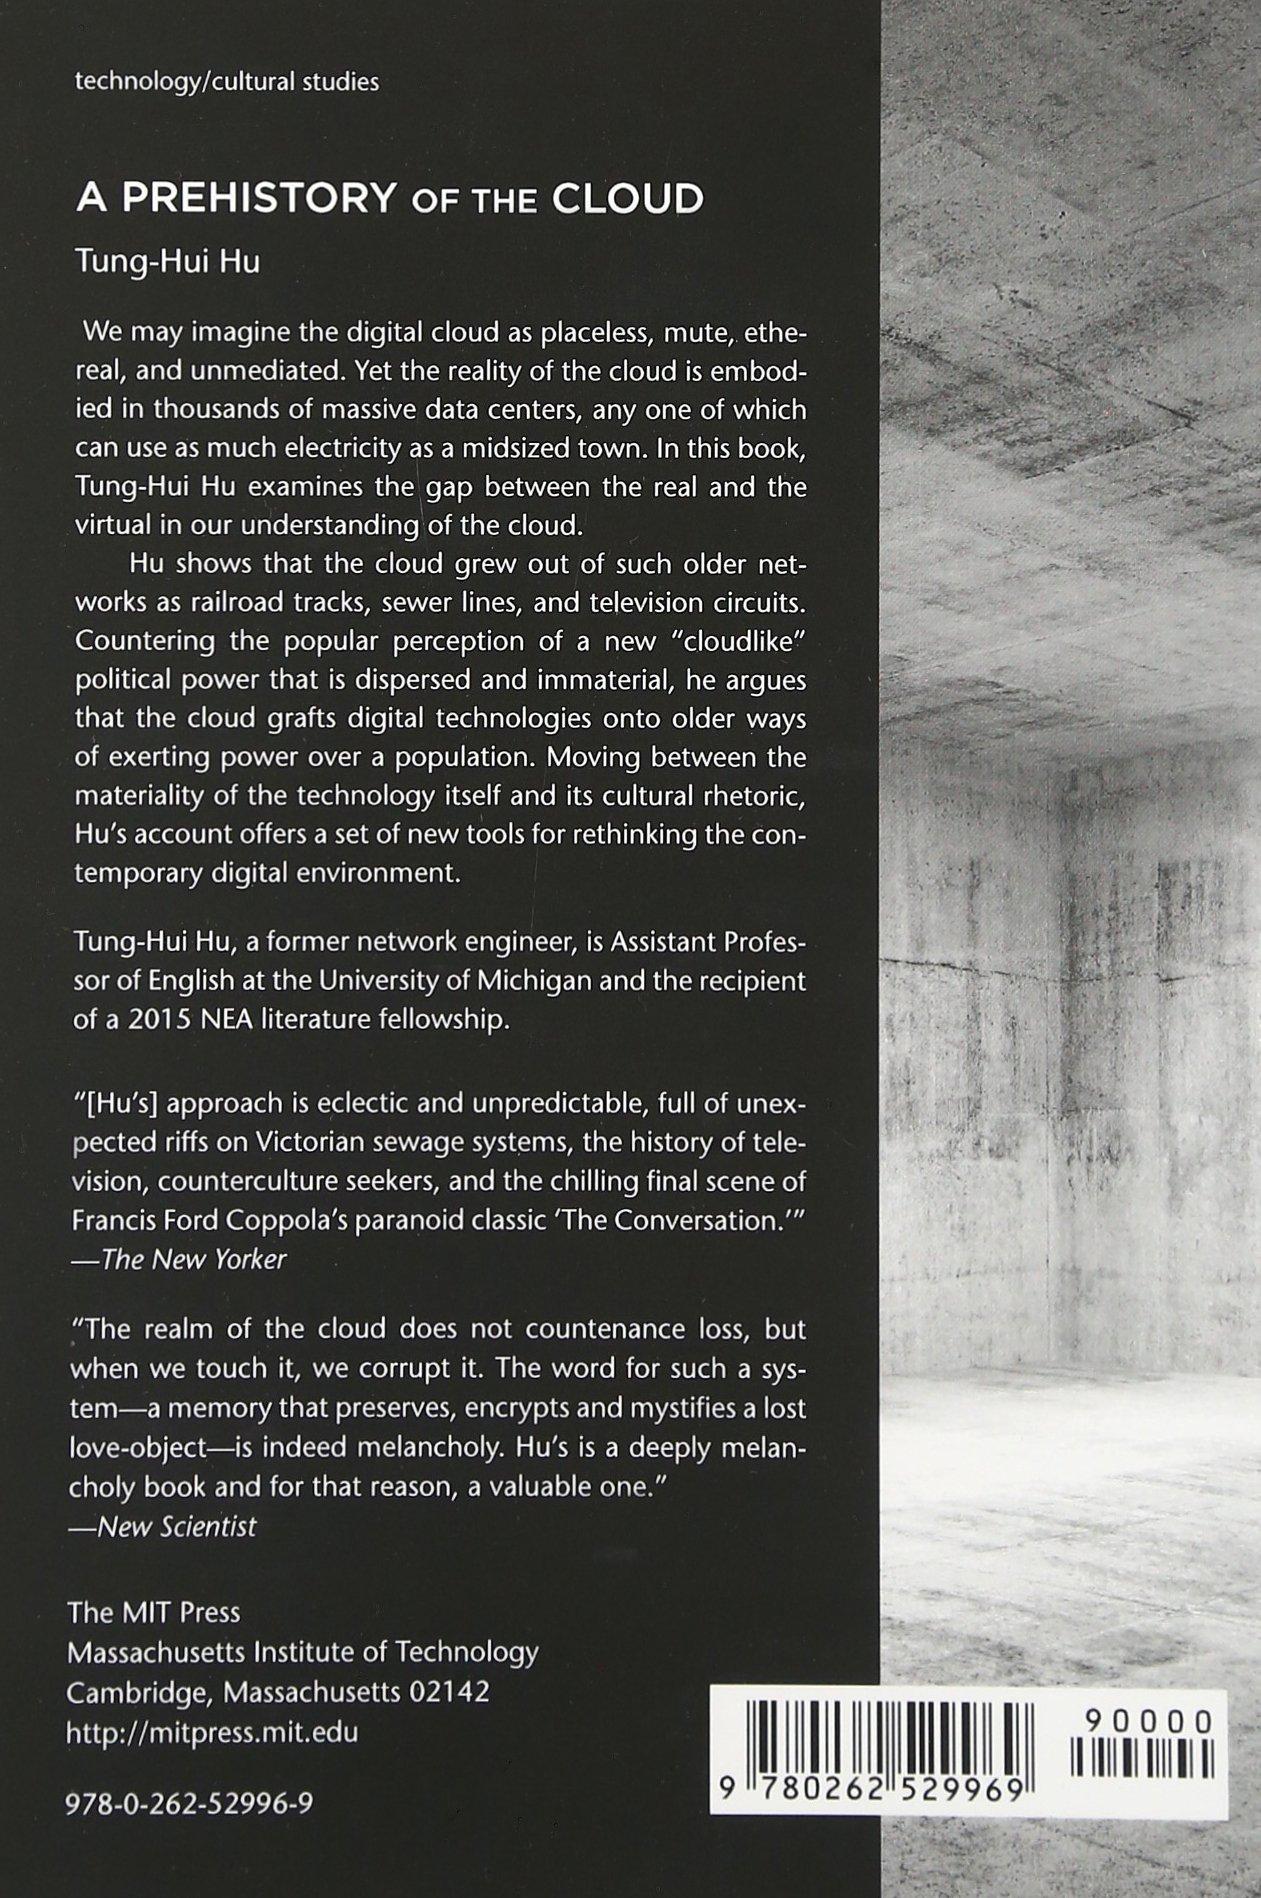 Amazon: A Prehistory Of The Cloud (mit Press) (9780262529969): Tunghui  Hu: Books